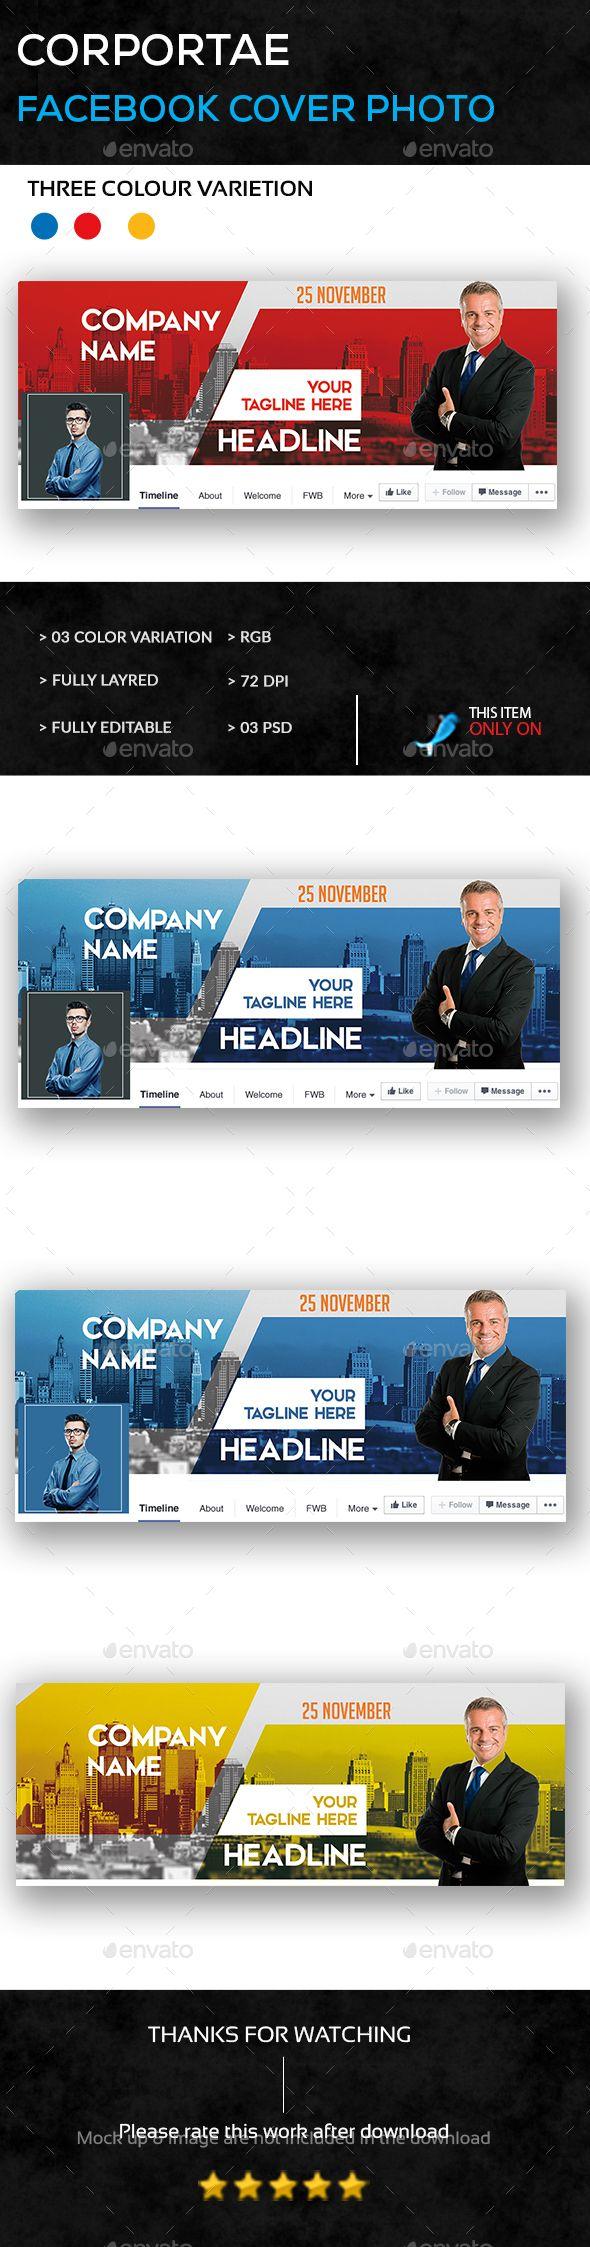 Corporate Facebook Cover Photo Template PSD